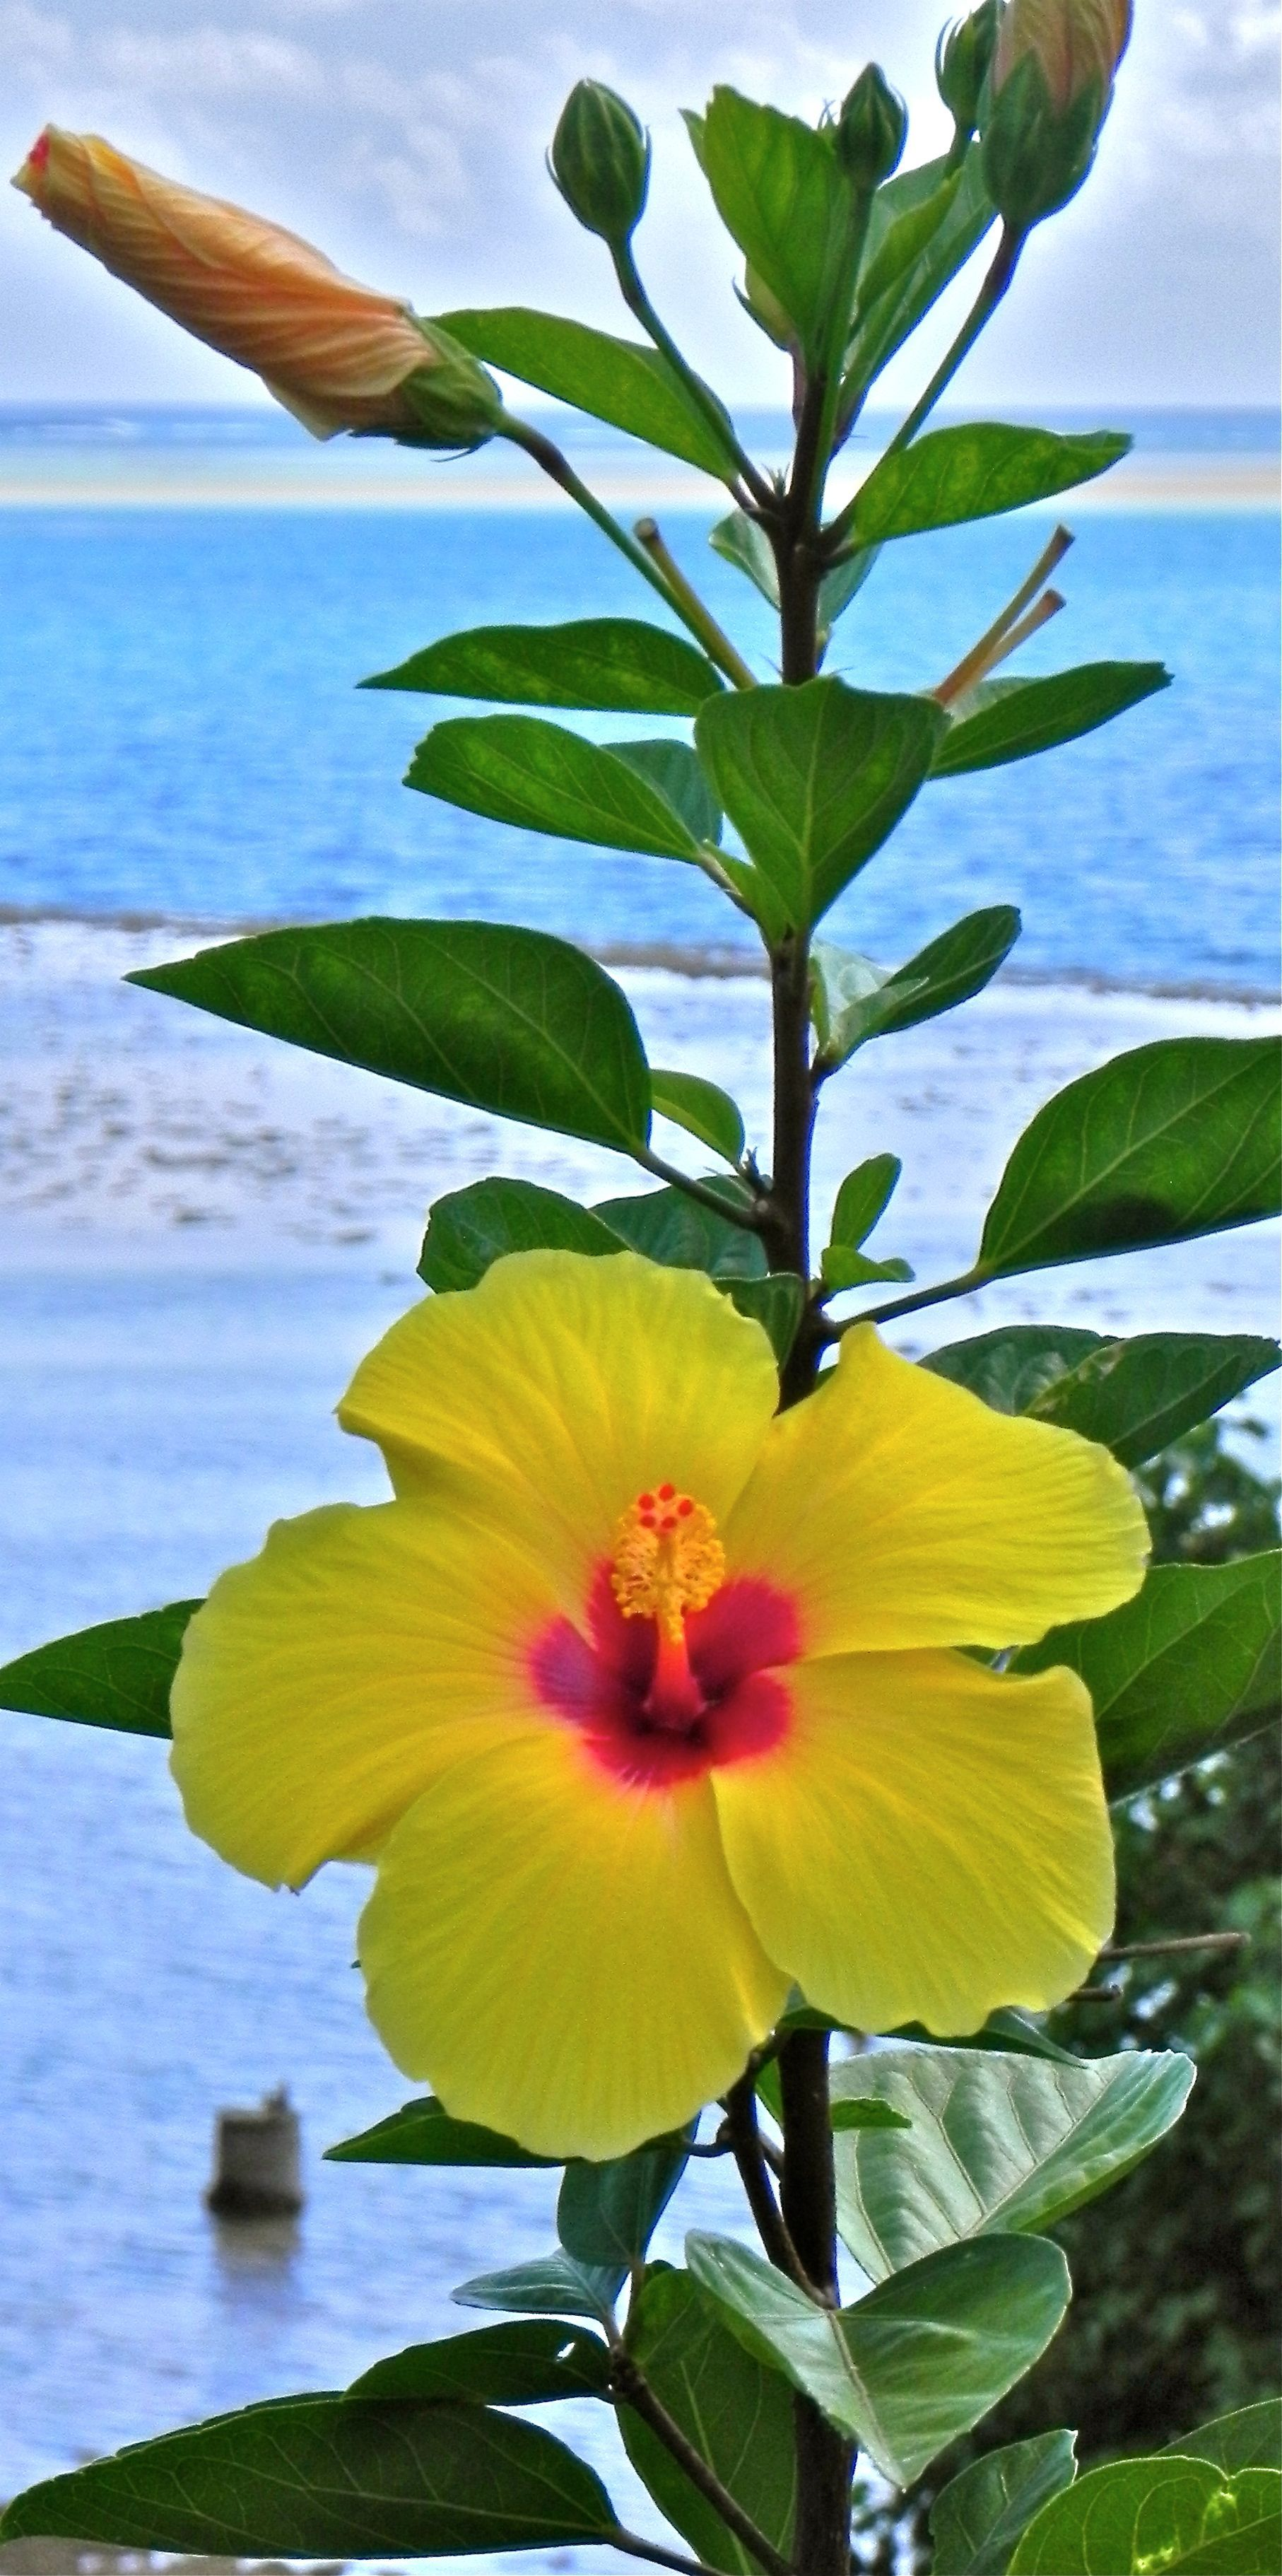 Hibiscus hawaii aunt donnas favorite flower she can wear a lei of hibiscus hawaii aunt donnas favorite flower she can wear a lei of them at our family reunion izmirmasajfo